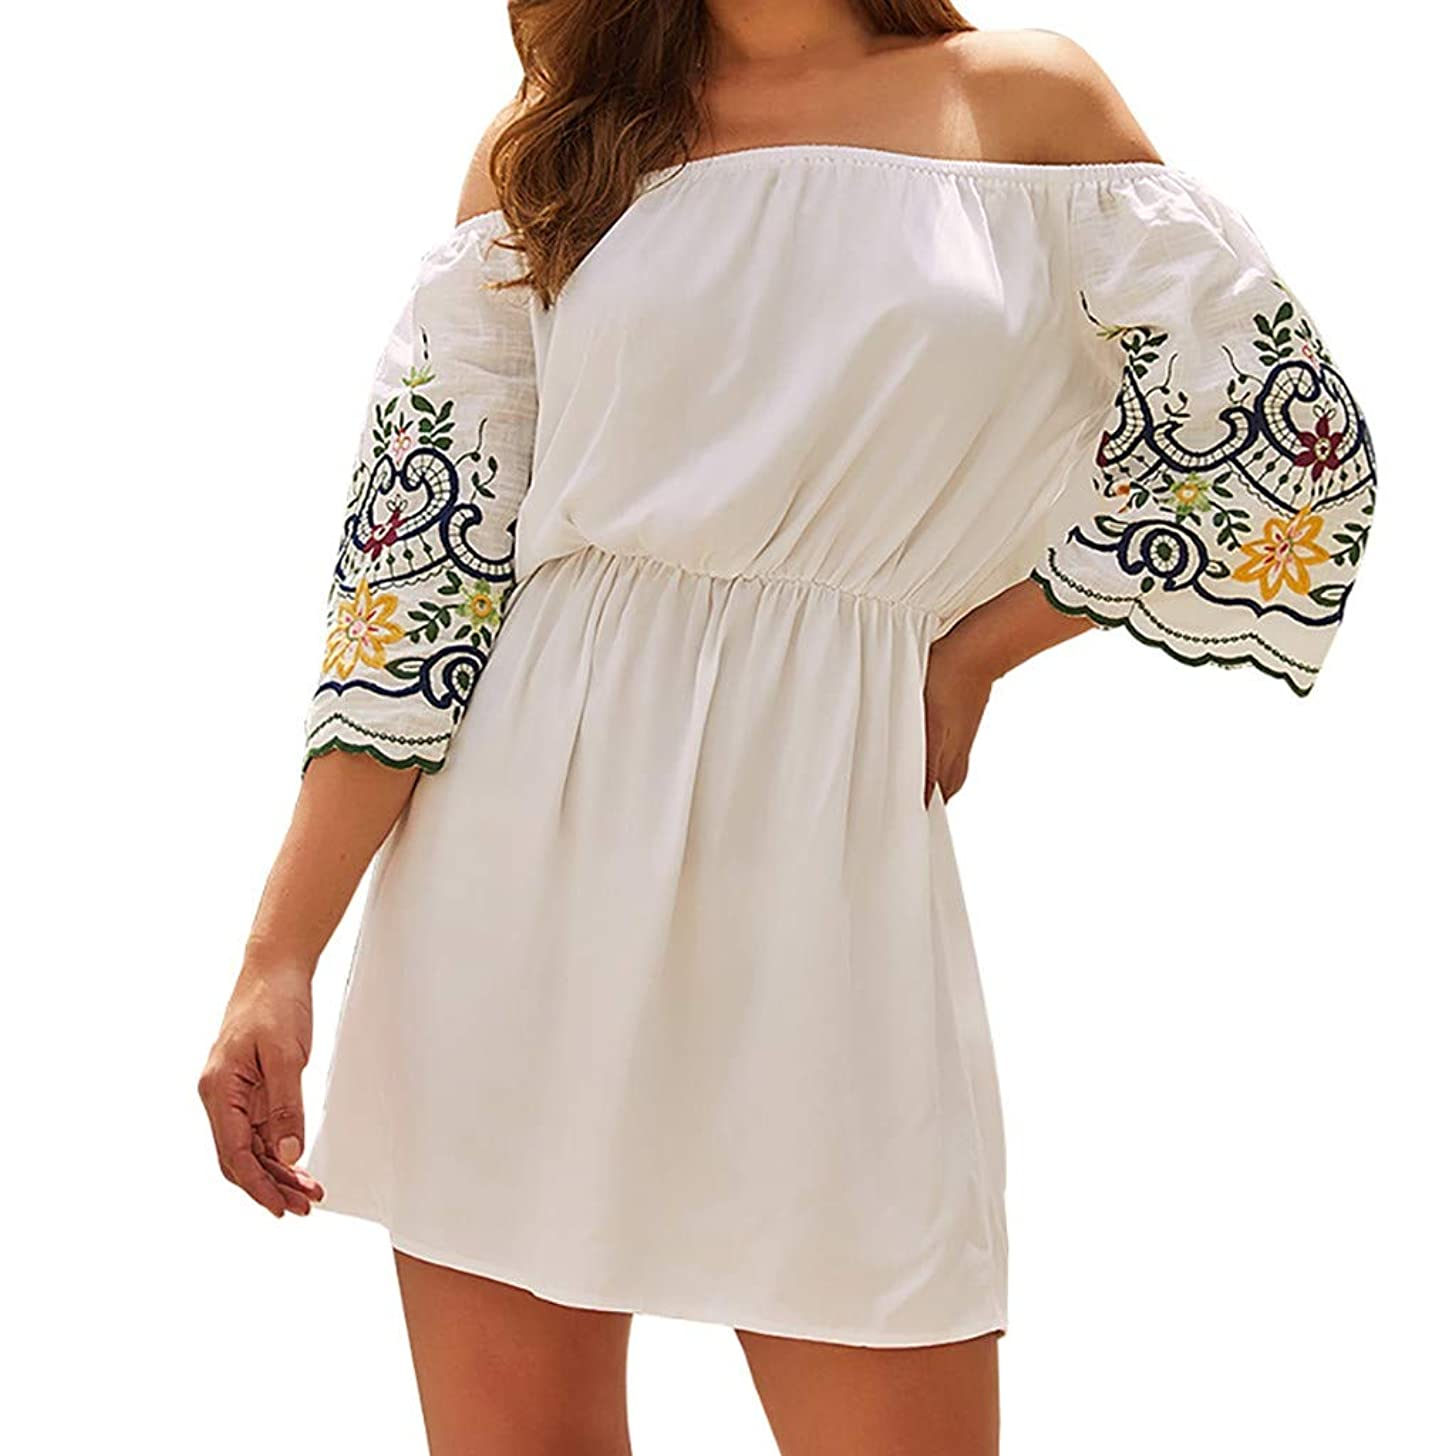 Women Boho Off Shoulder Mini Dress Half Sleeve Elastic Waist Embroidery Printed Loose Summer Beach Short Dresses